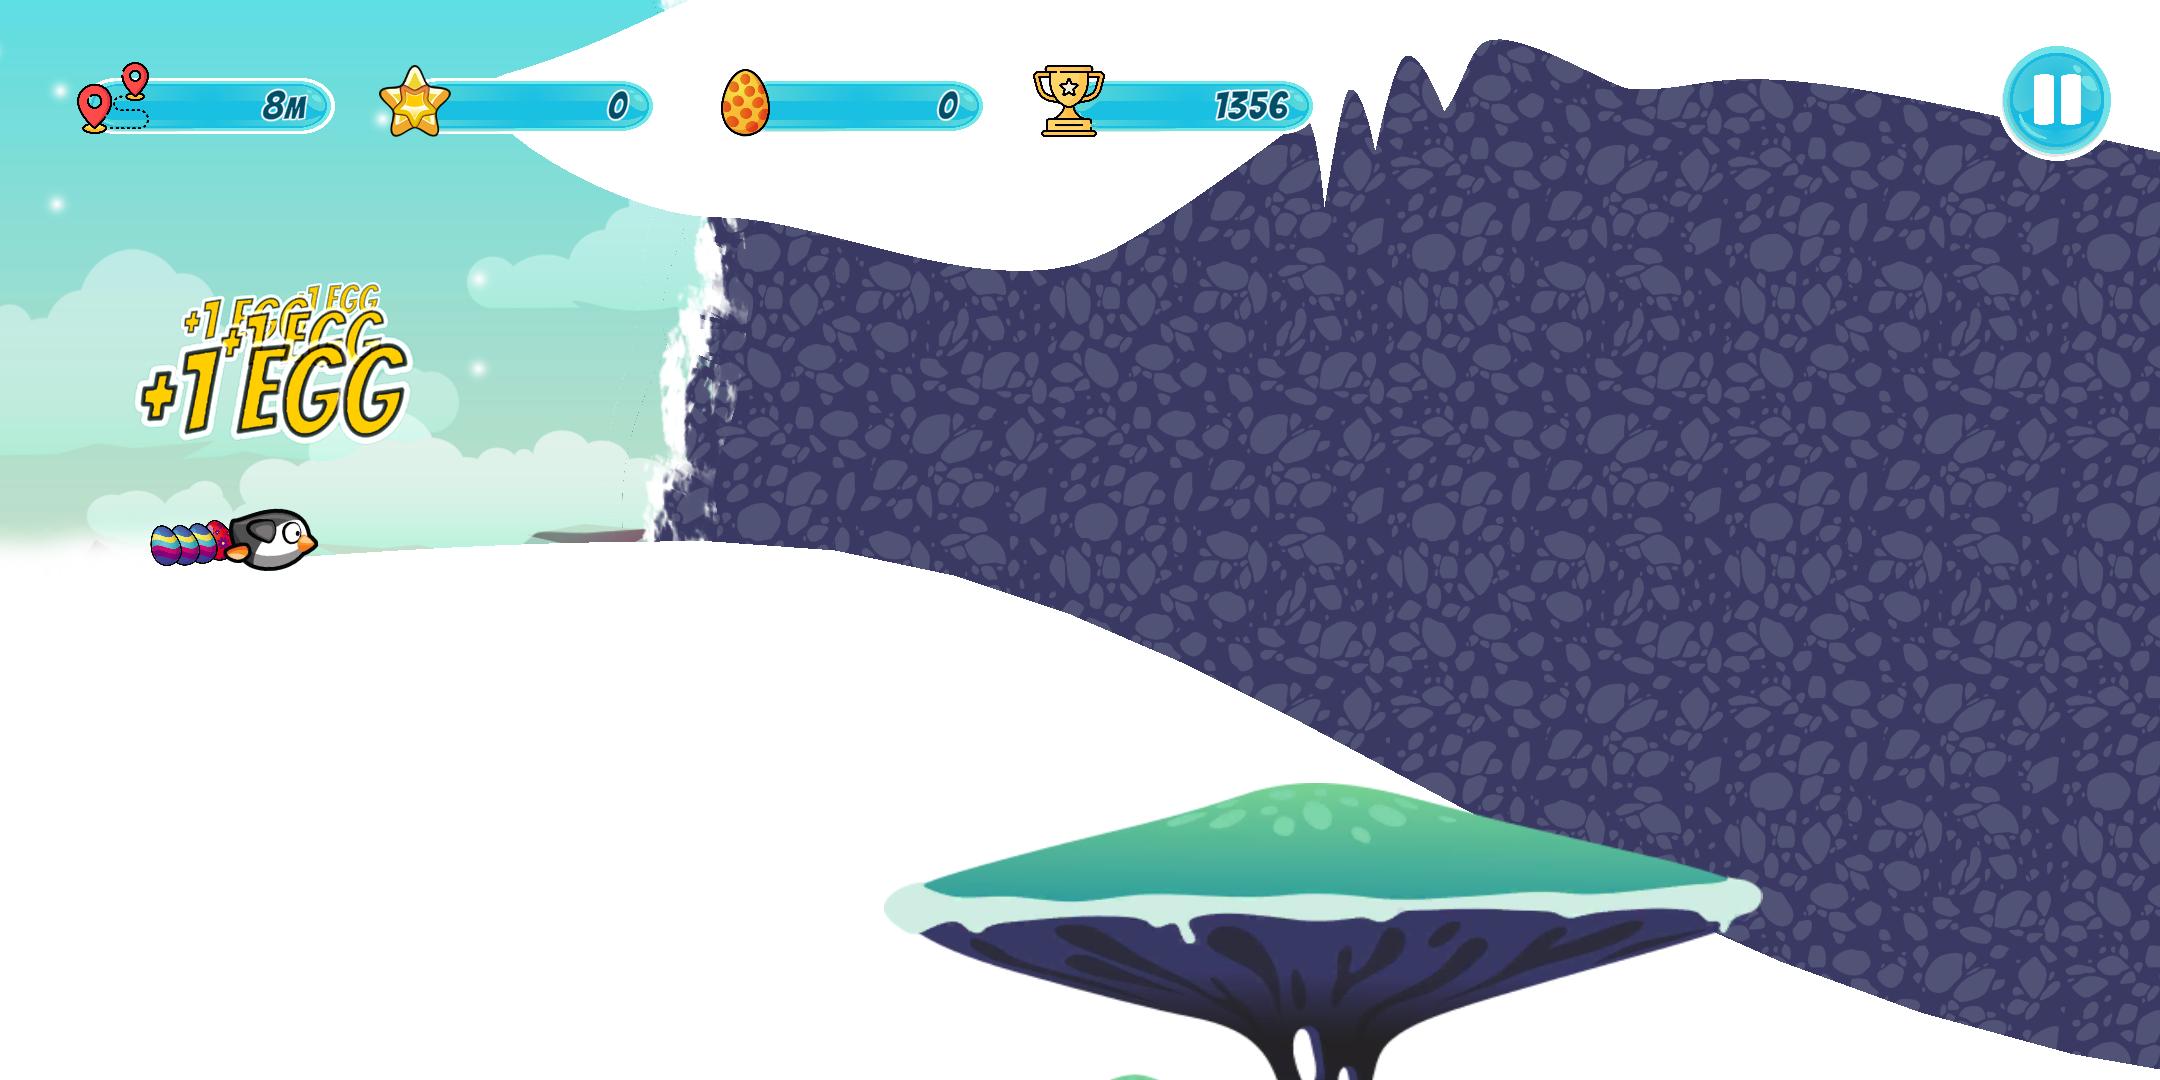 Screenshot 4: Pingo - the sliding penguin